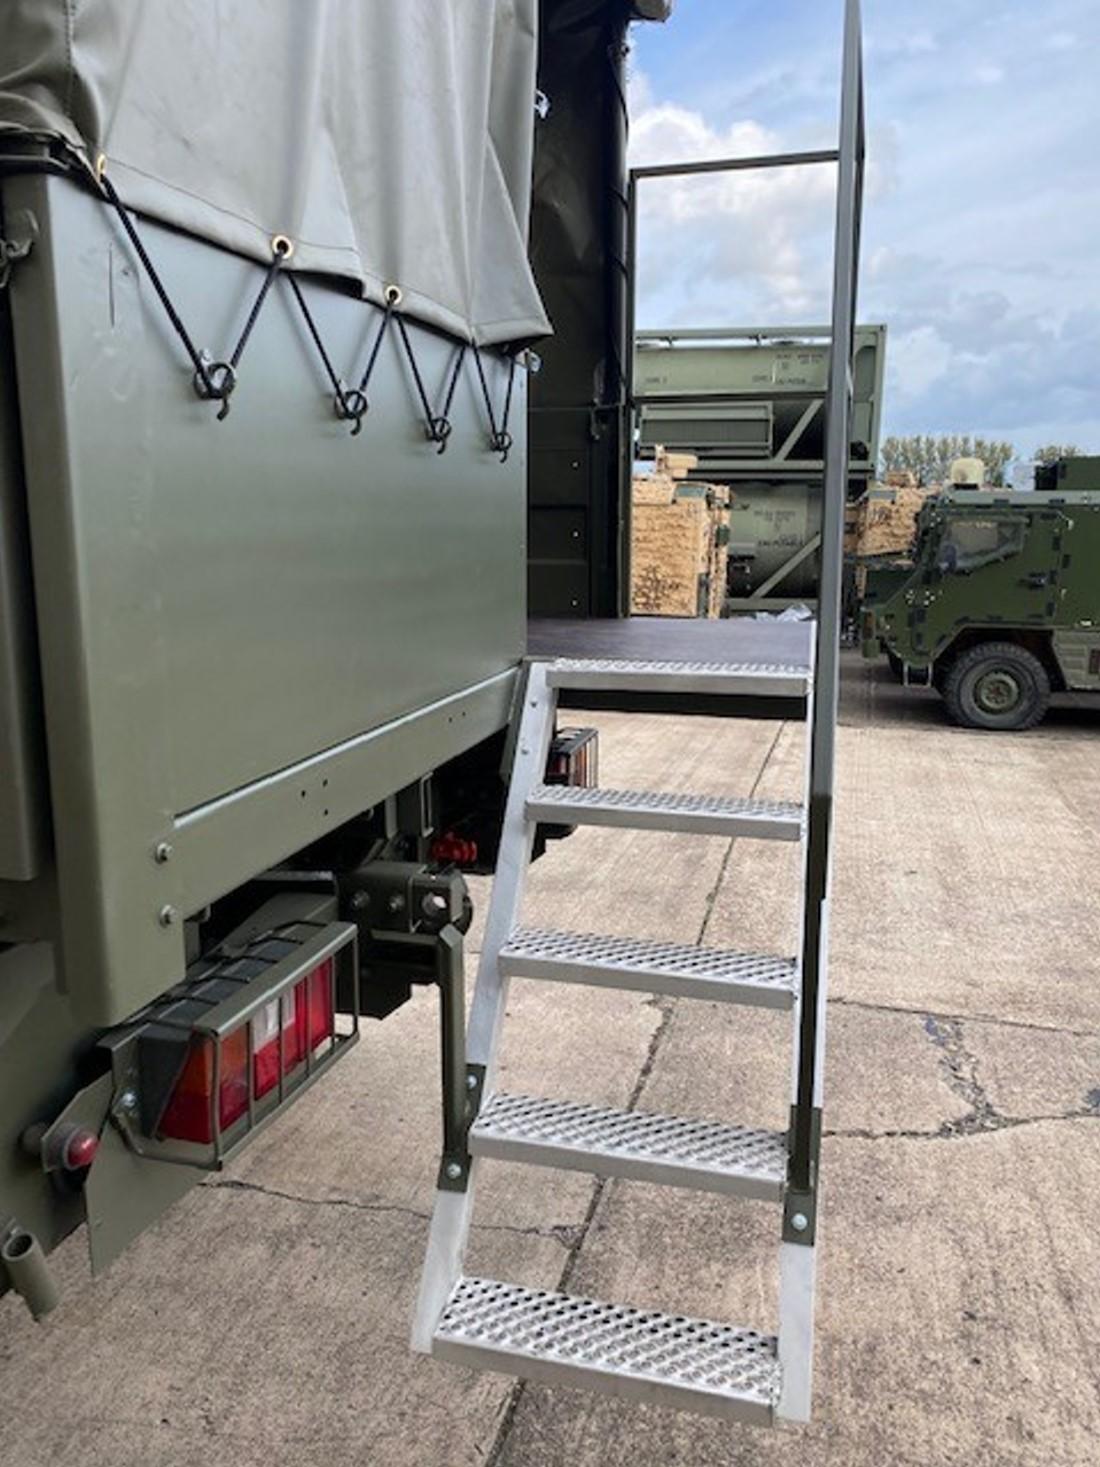 Leyland Daf 45.150 4x4 Shoot Vehicle Gun Bus   used military vehicles, MOD surplus for sale